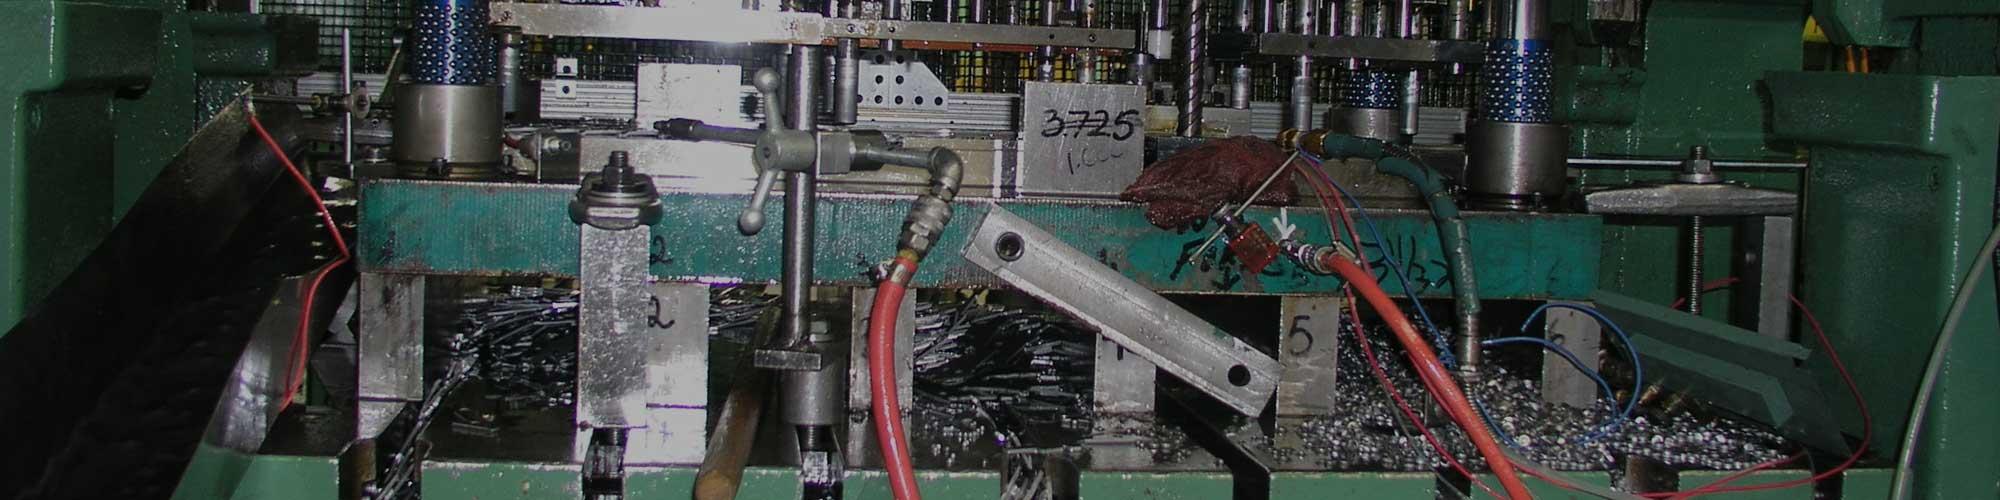 Amazing New Sheet Metal Rapid Prototyping